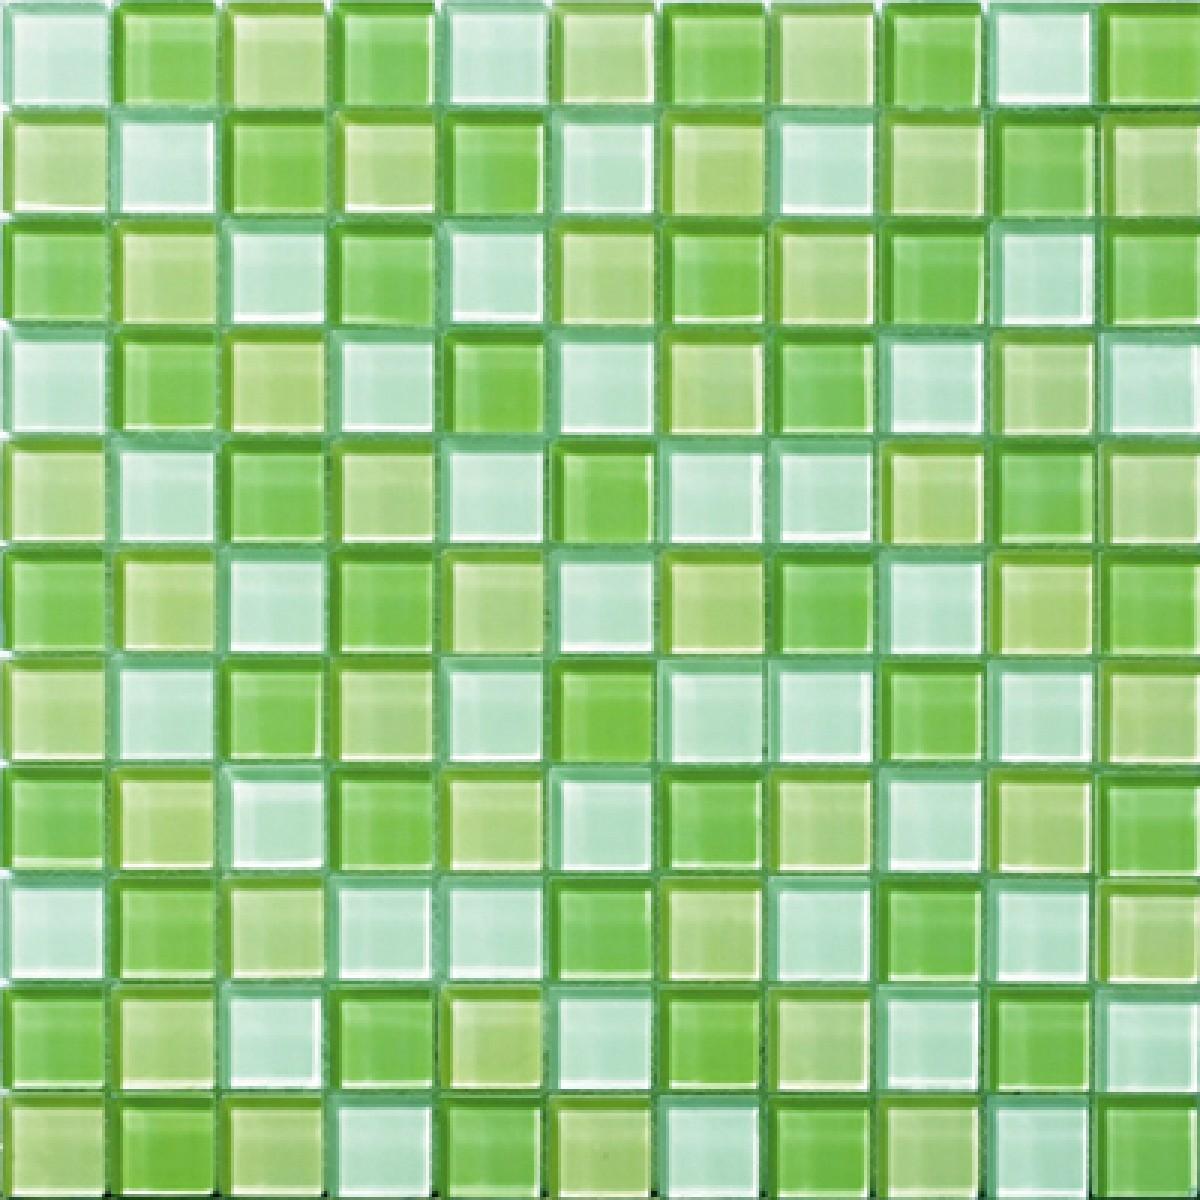 Glazed Mosaic Tiles : Glossyapple green blend glass mosaic tile mesh backed sheet